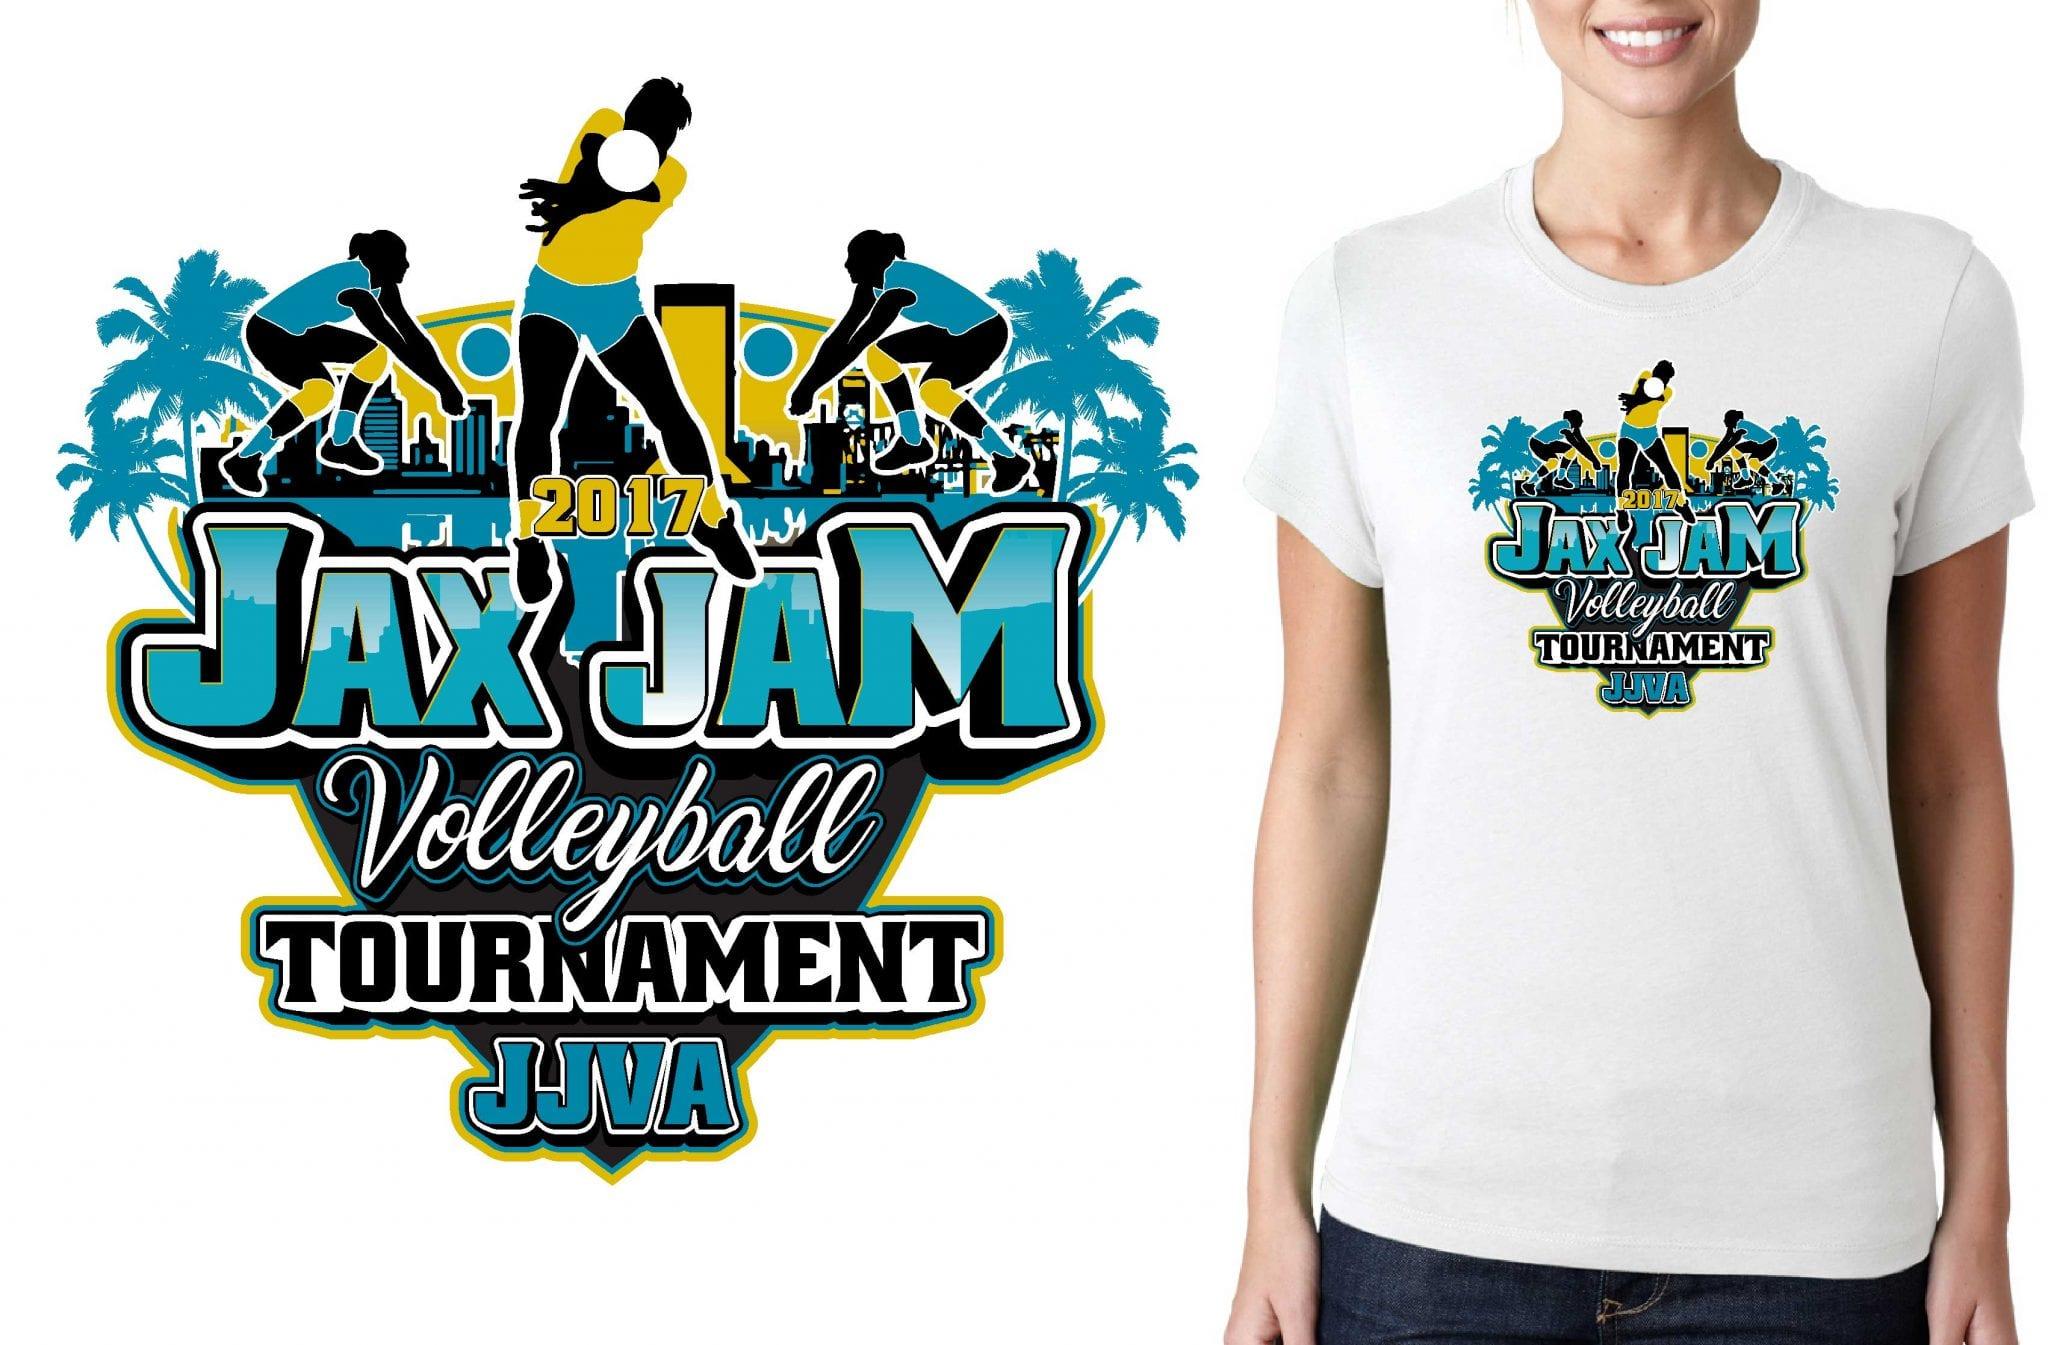 2017 JAX Jam vector logo design for t-shirt lacrosse urartstudio.com